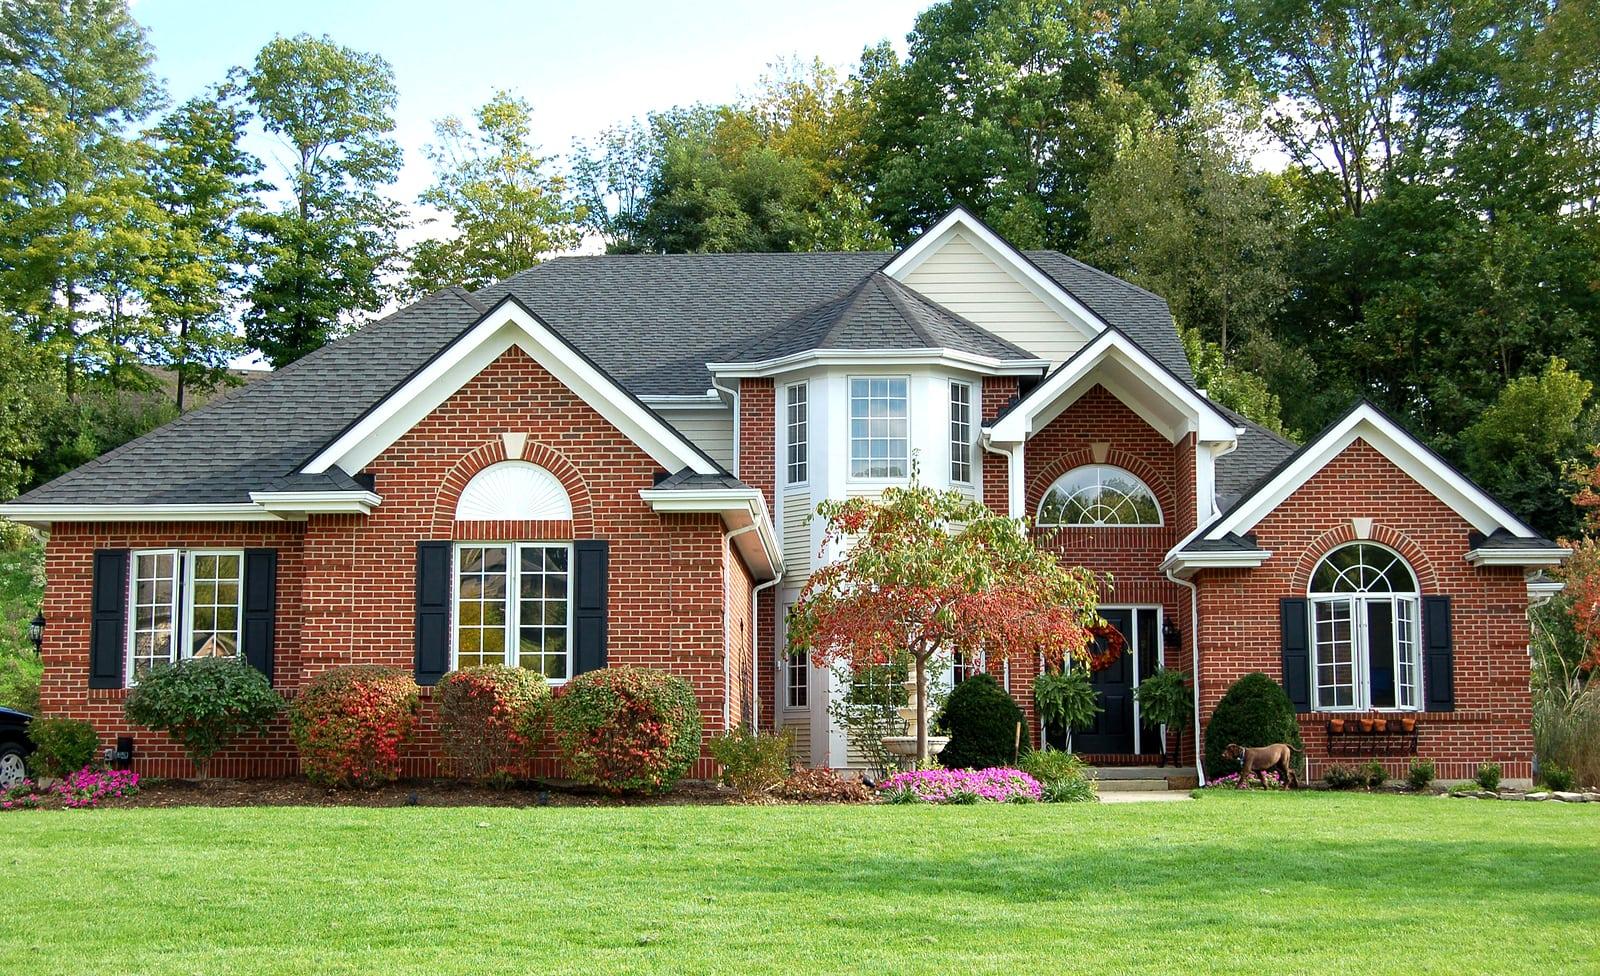 home with a brick exterior